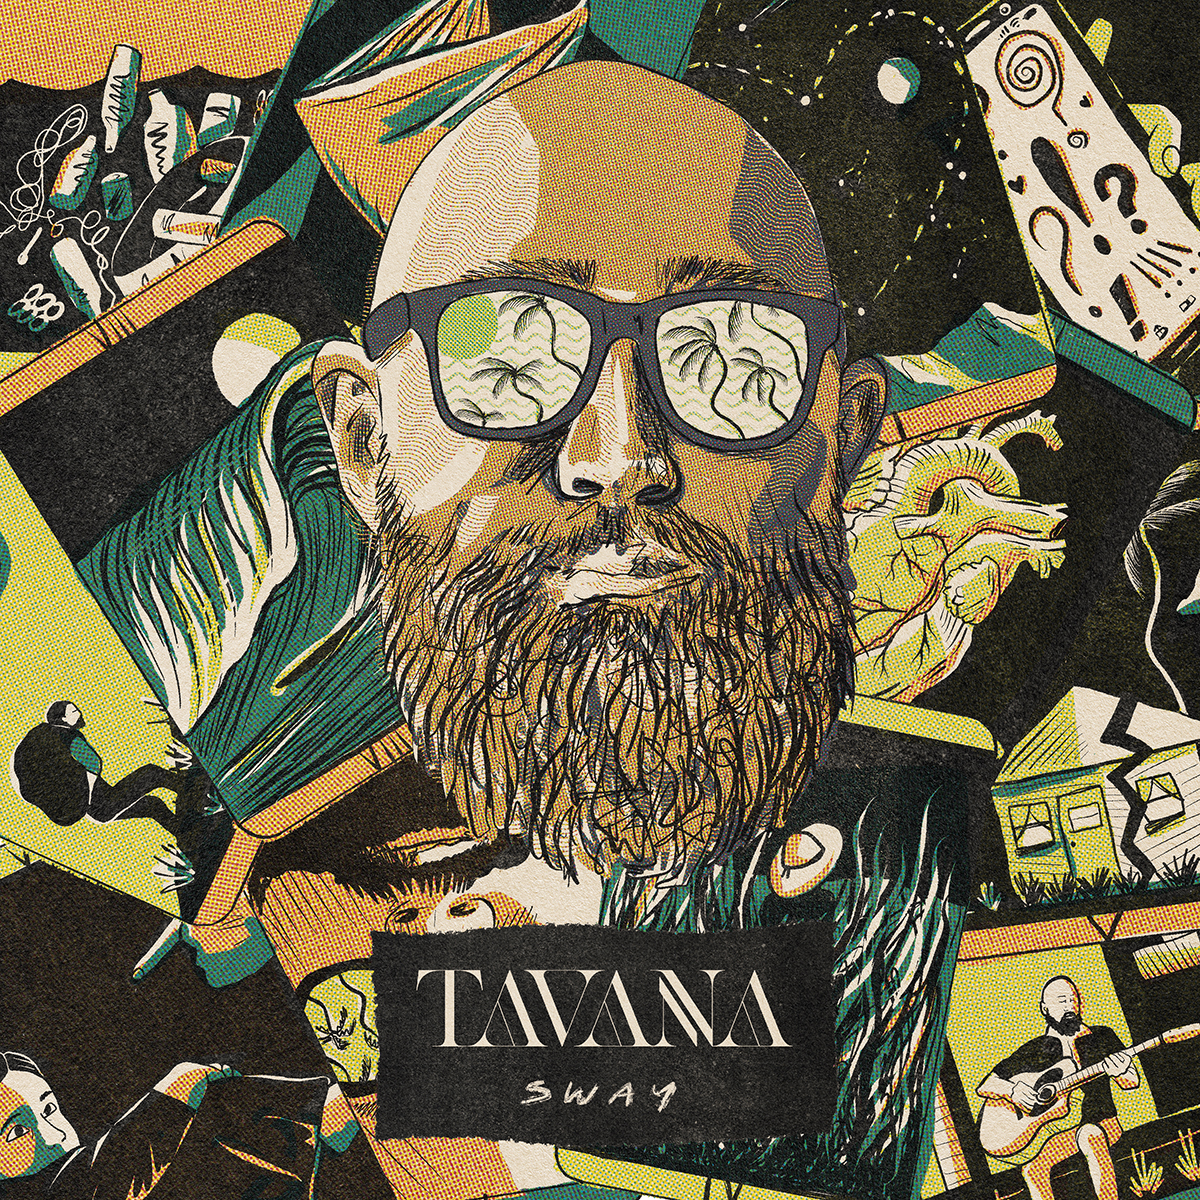 Tavana Sway Album Cover